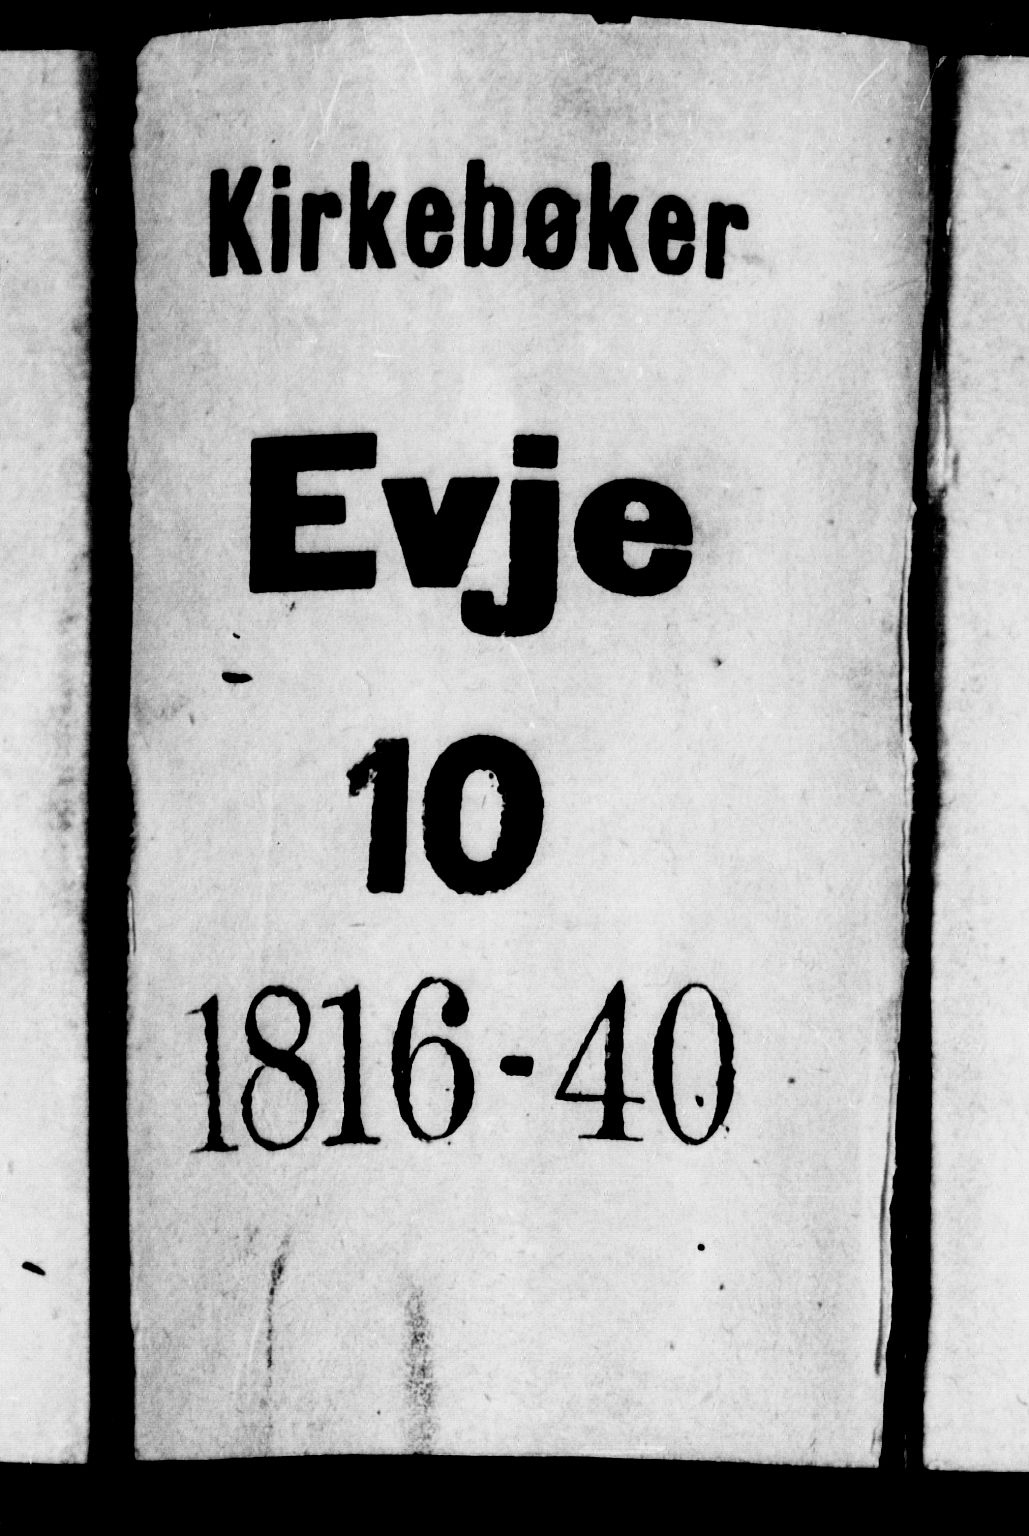 SAK, Evje sokneprestkontor, F/Fa/Faa/L0004: Ministerialbok nr. A 4, 1816-1840